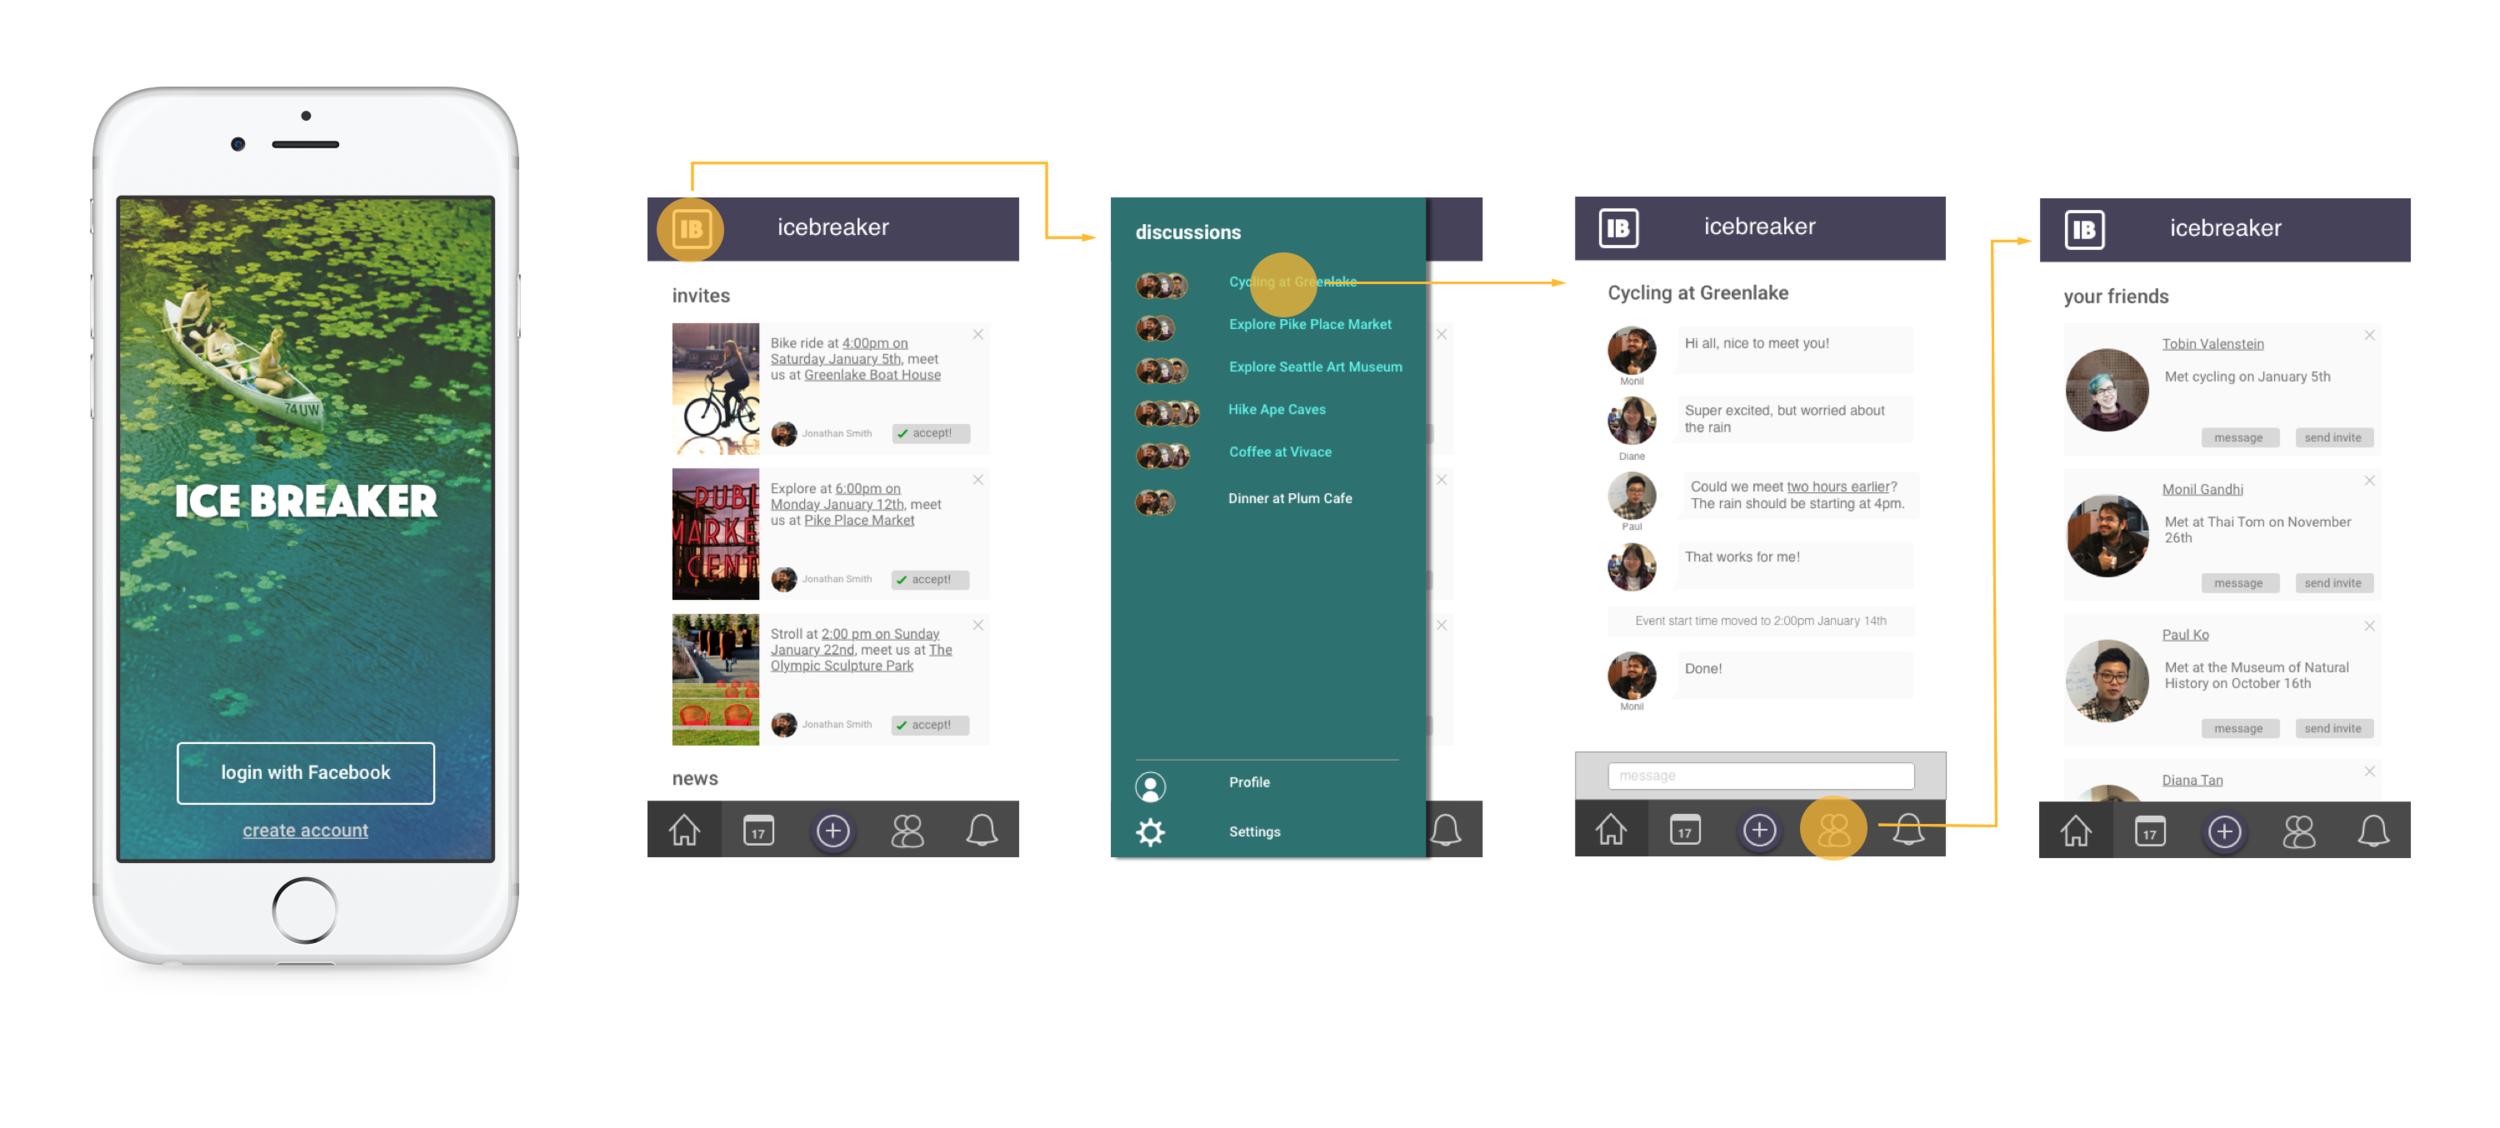 Splash screen > Home page > Drawer menu > Discussion > Friends list